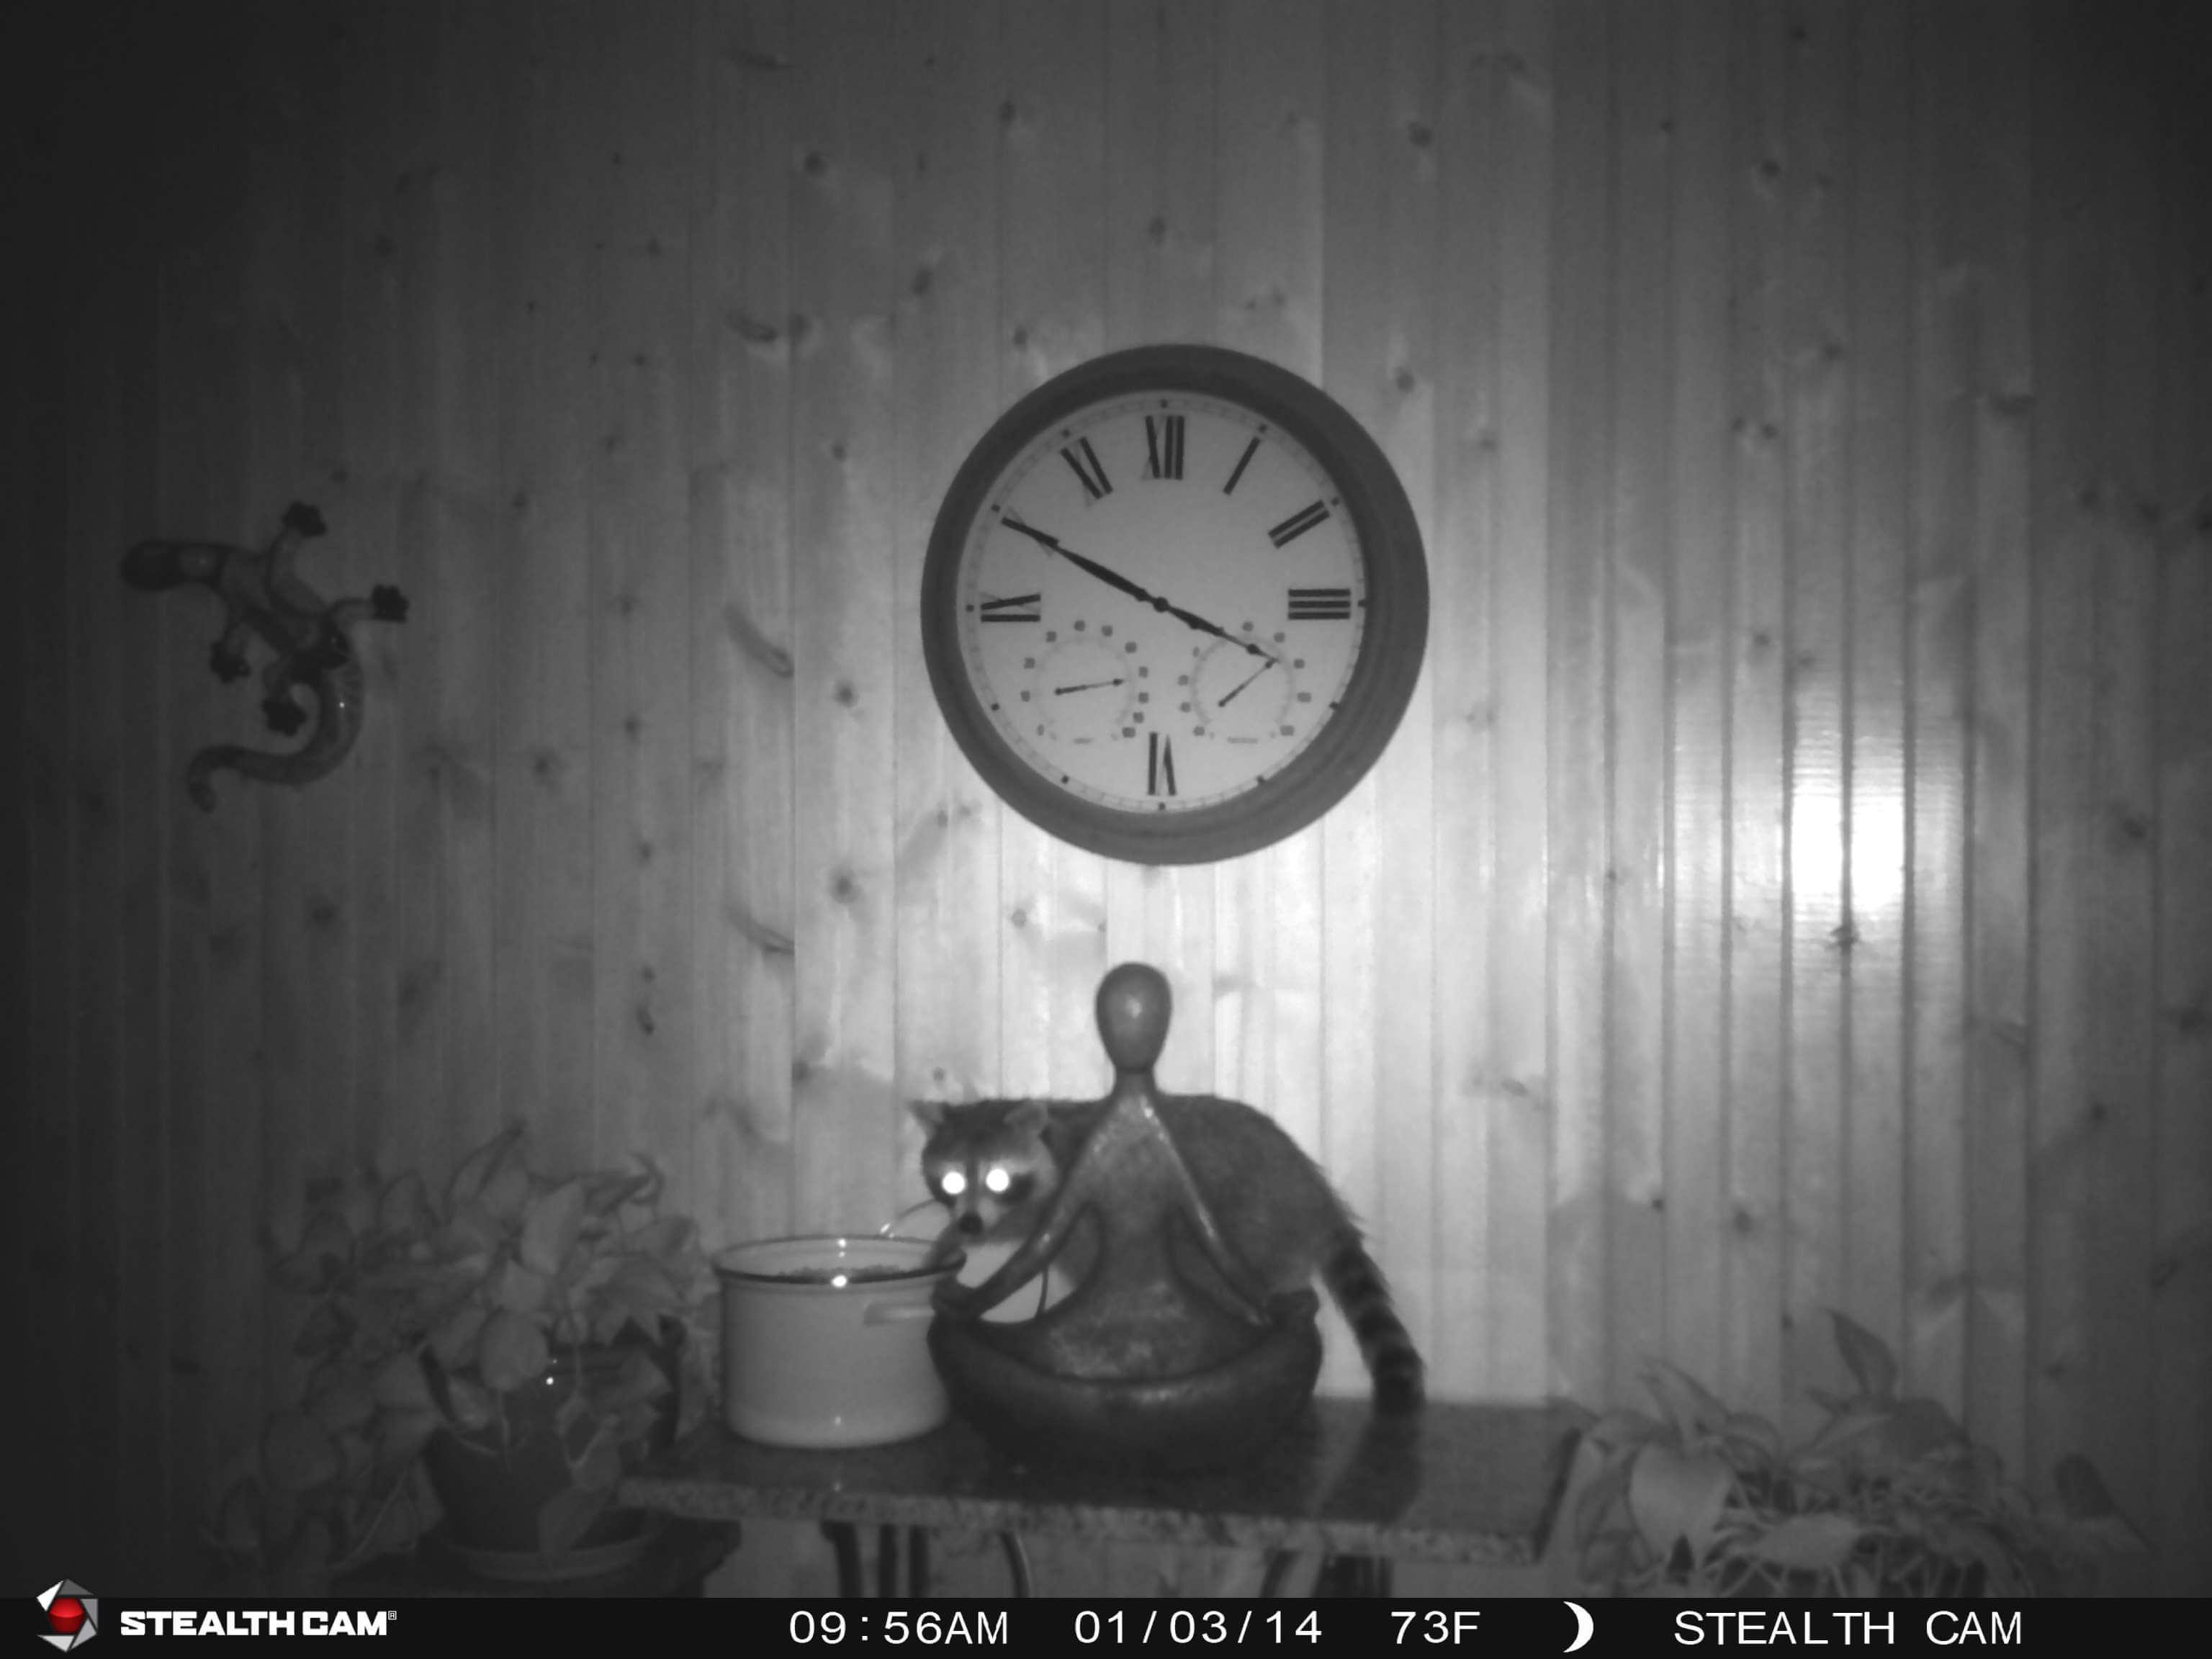 Raccoon game camera image of him stealing cat food at night